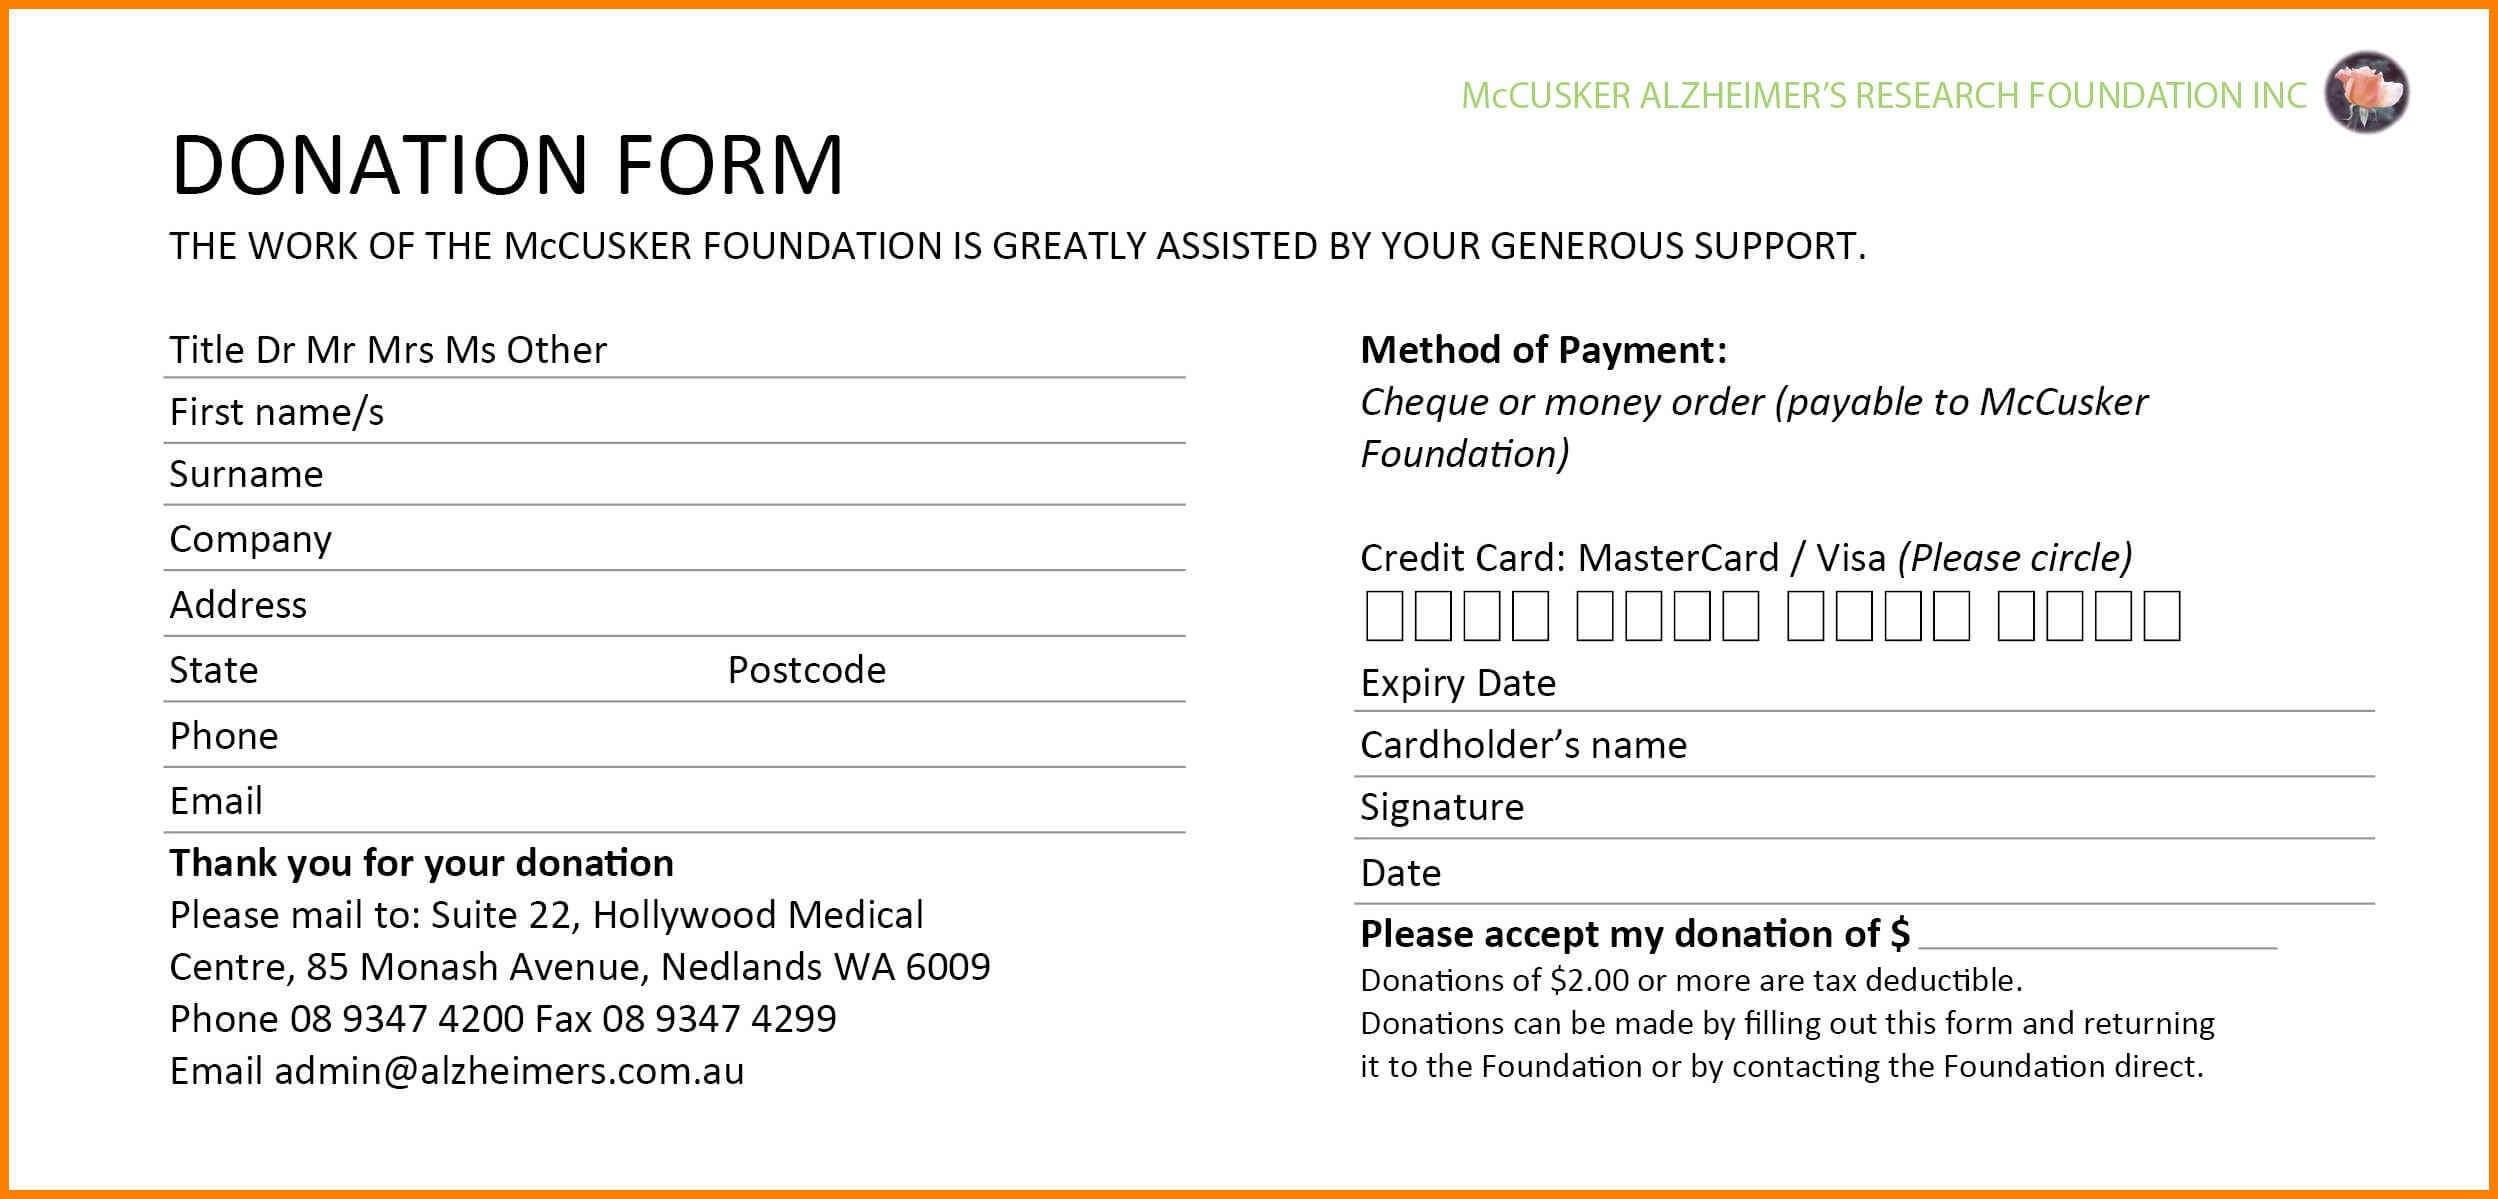 021 Donation Pledge Card Template Free Luxury Google With Donation Card Template Free